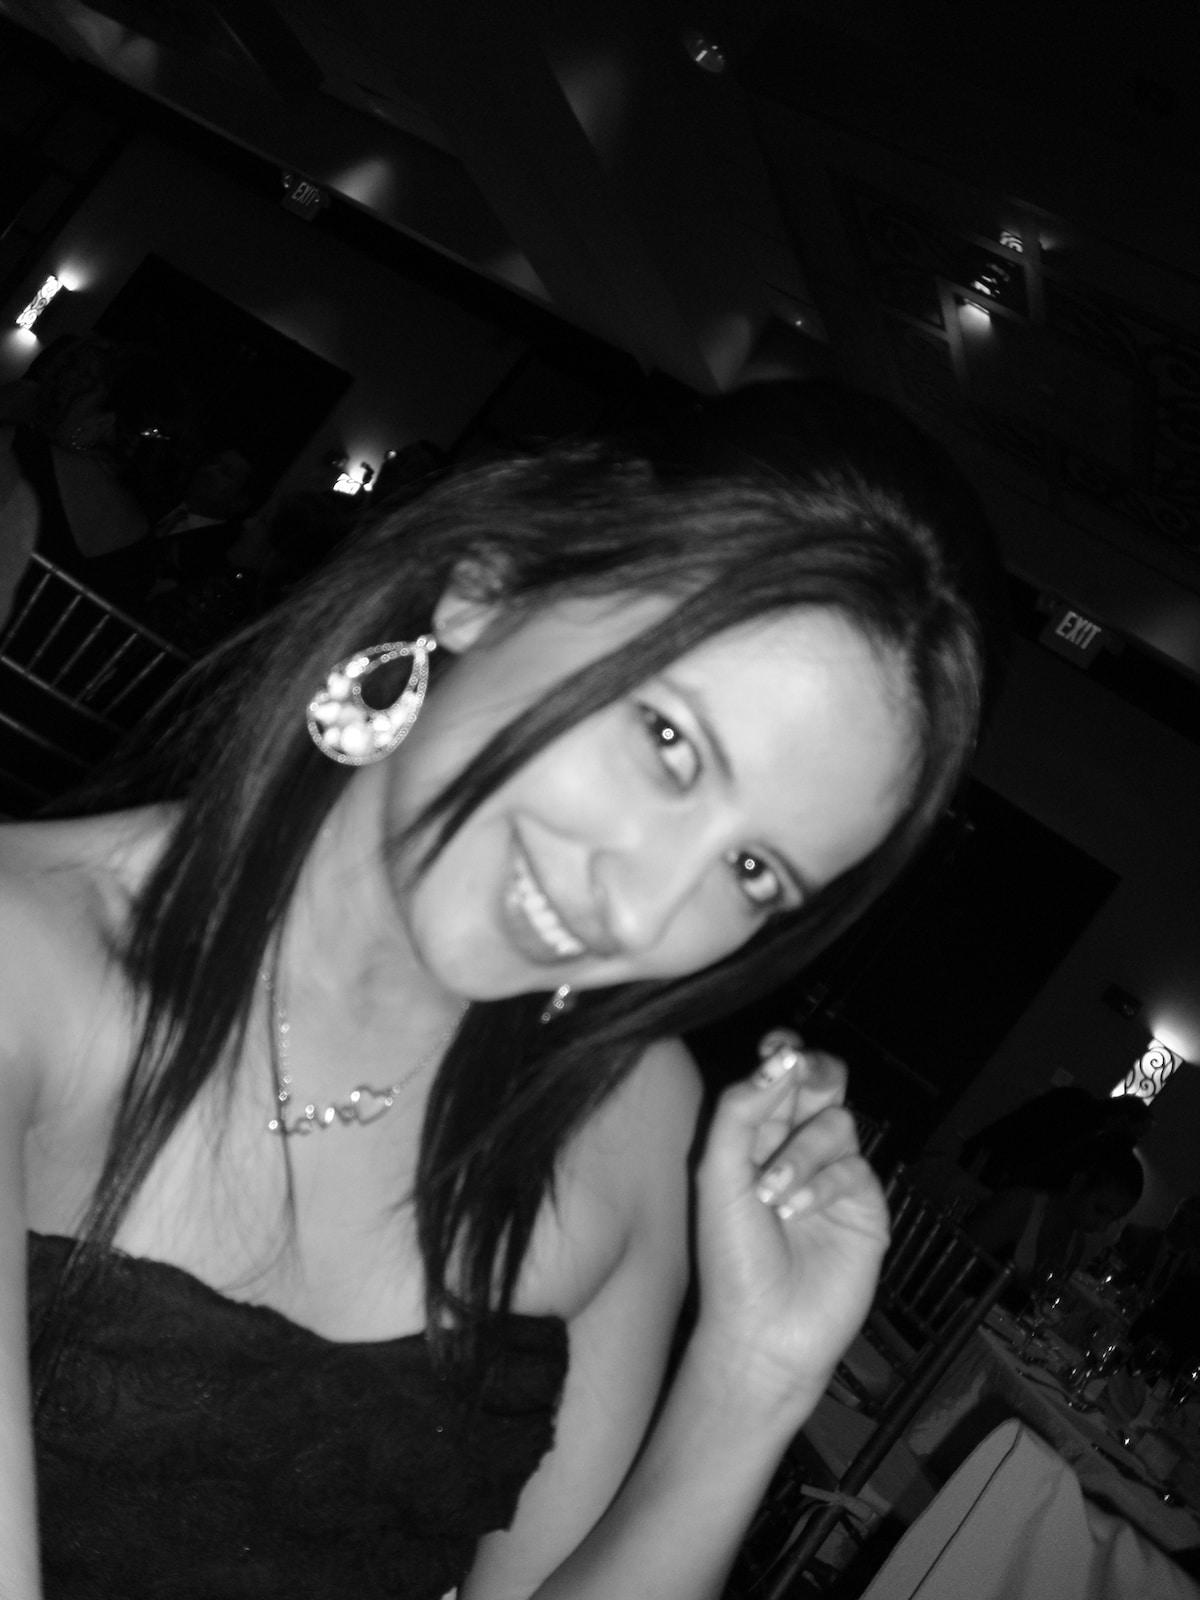 Paola Maribel From Quito, Ecuador